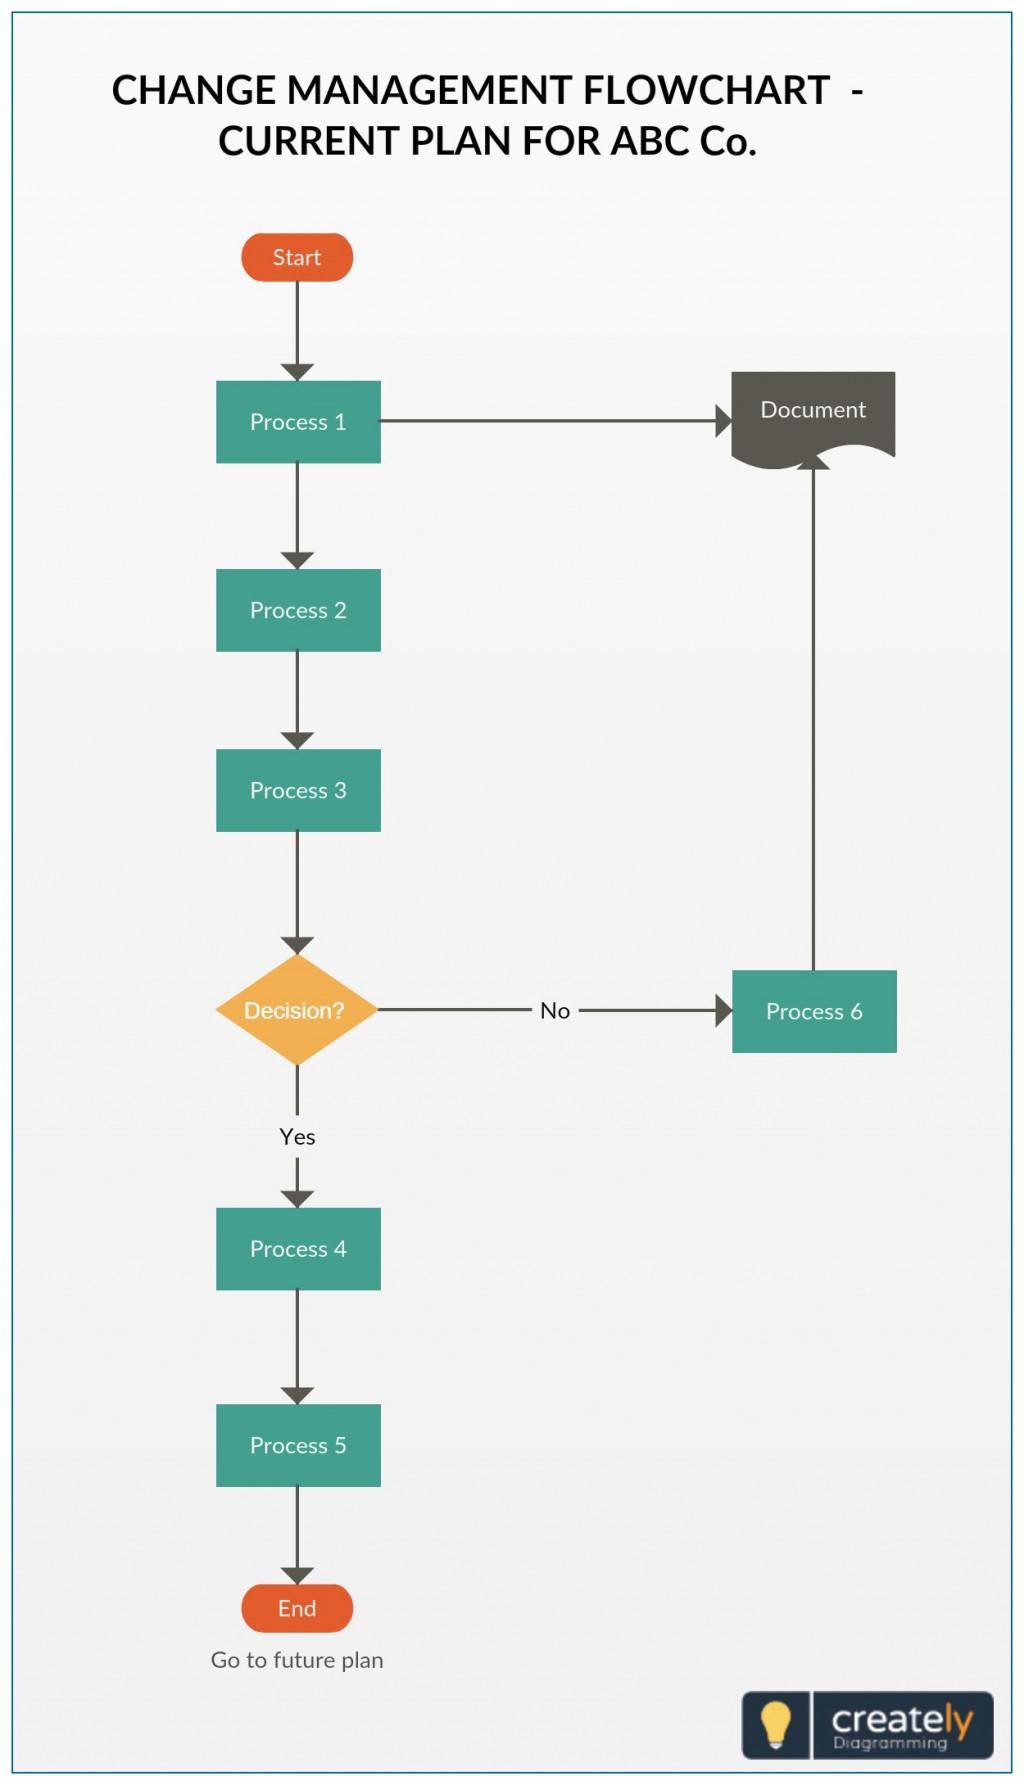 000 Remarkable Change Management Proces Template Sample Large